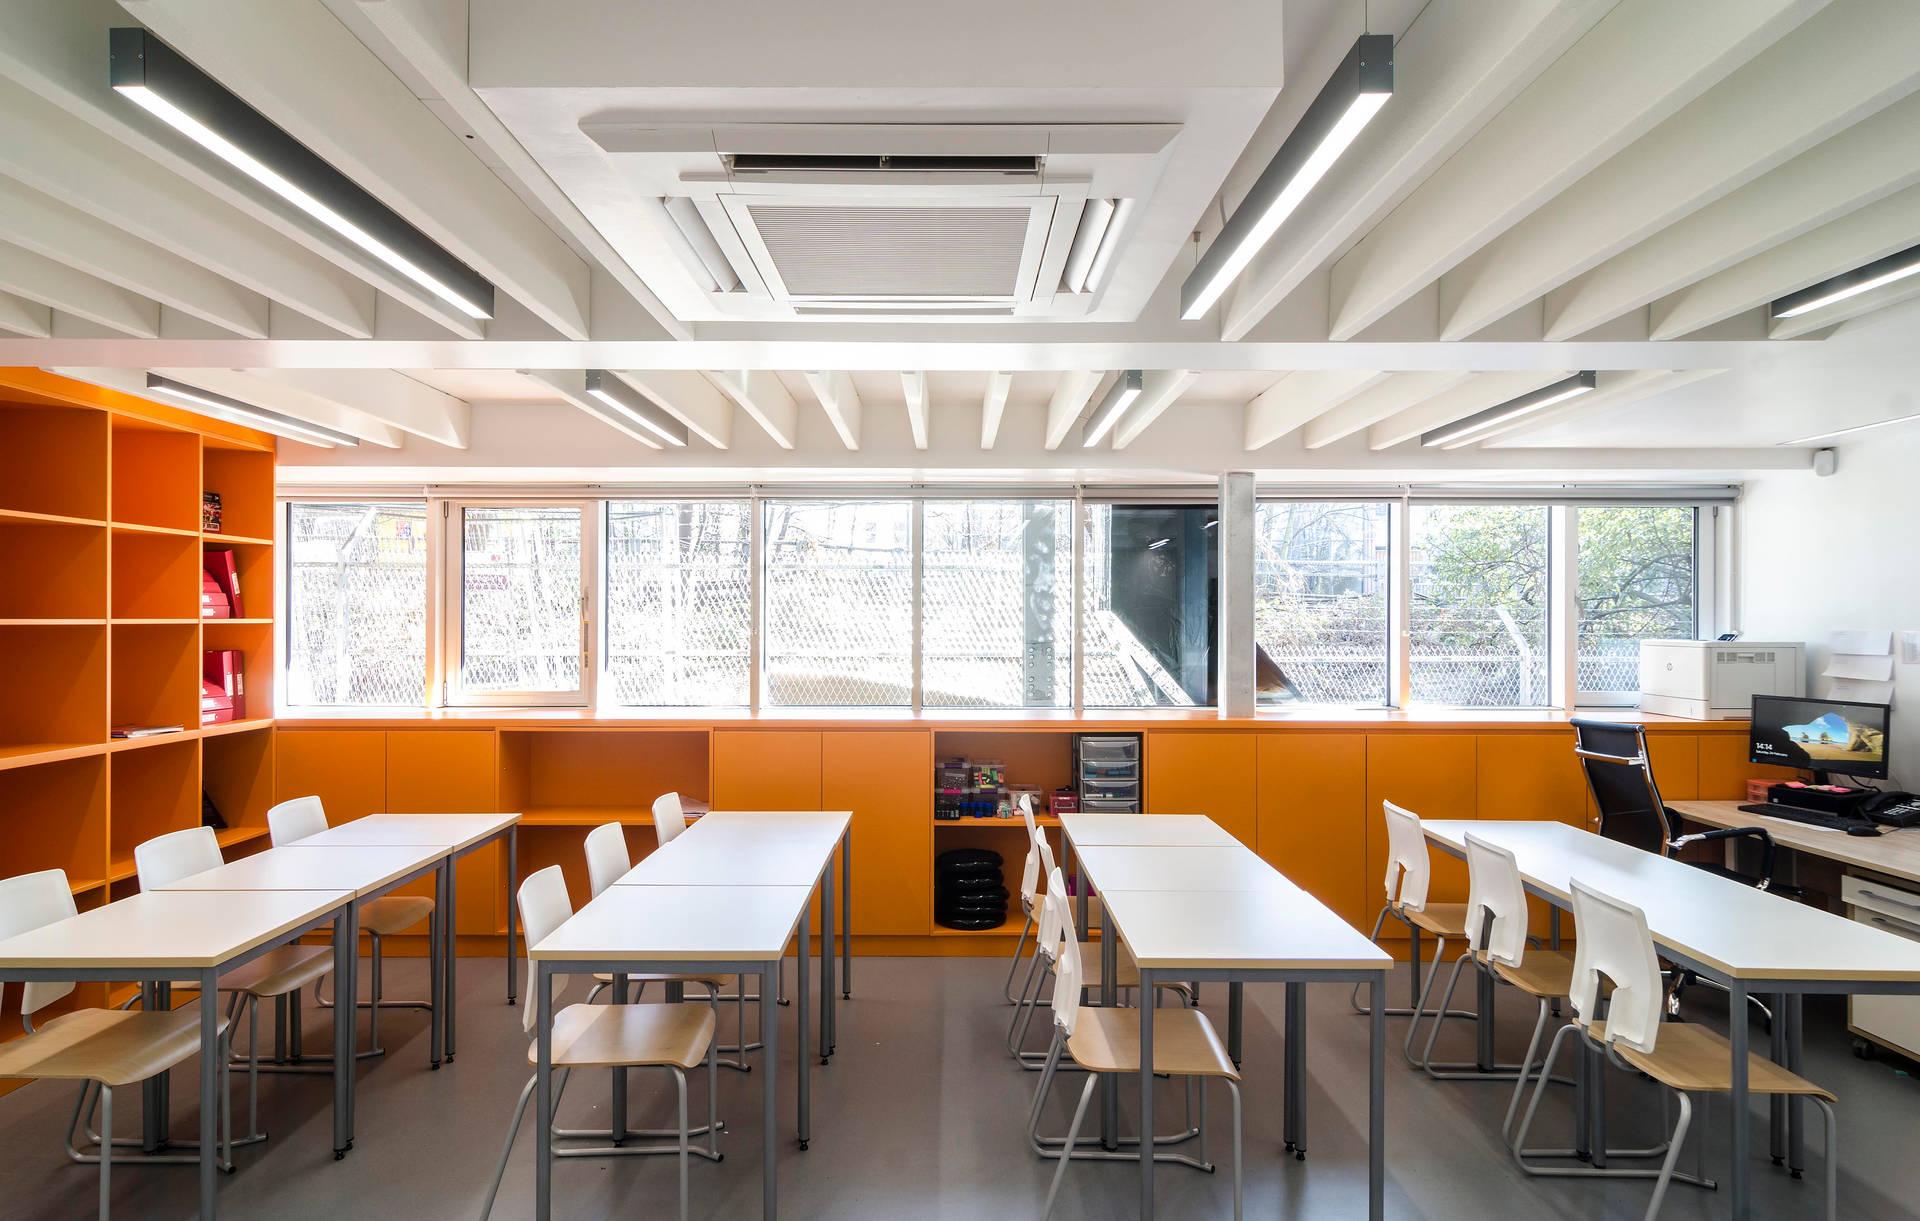 Classroom_©_Davide_Saibene_Photographer.jpg